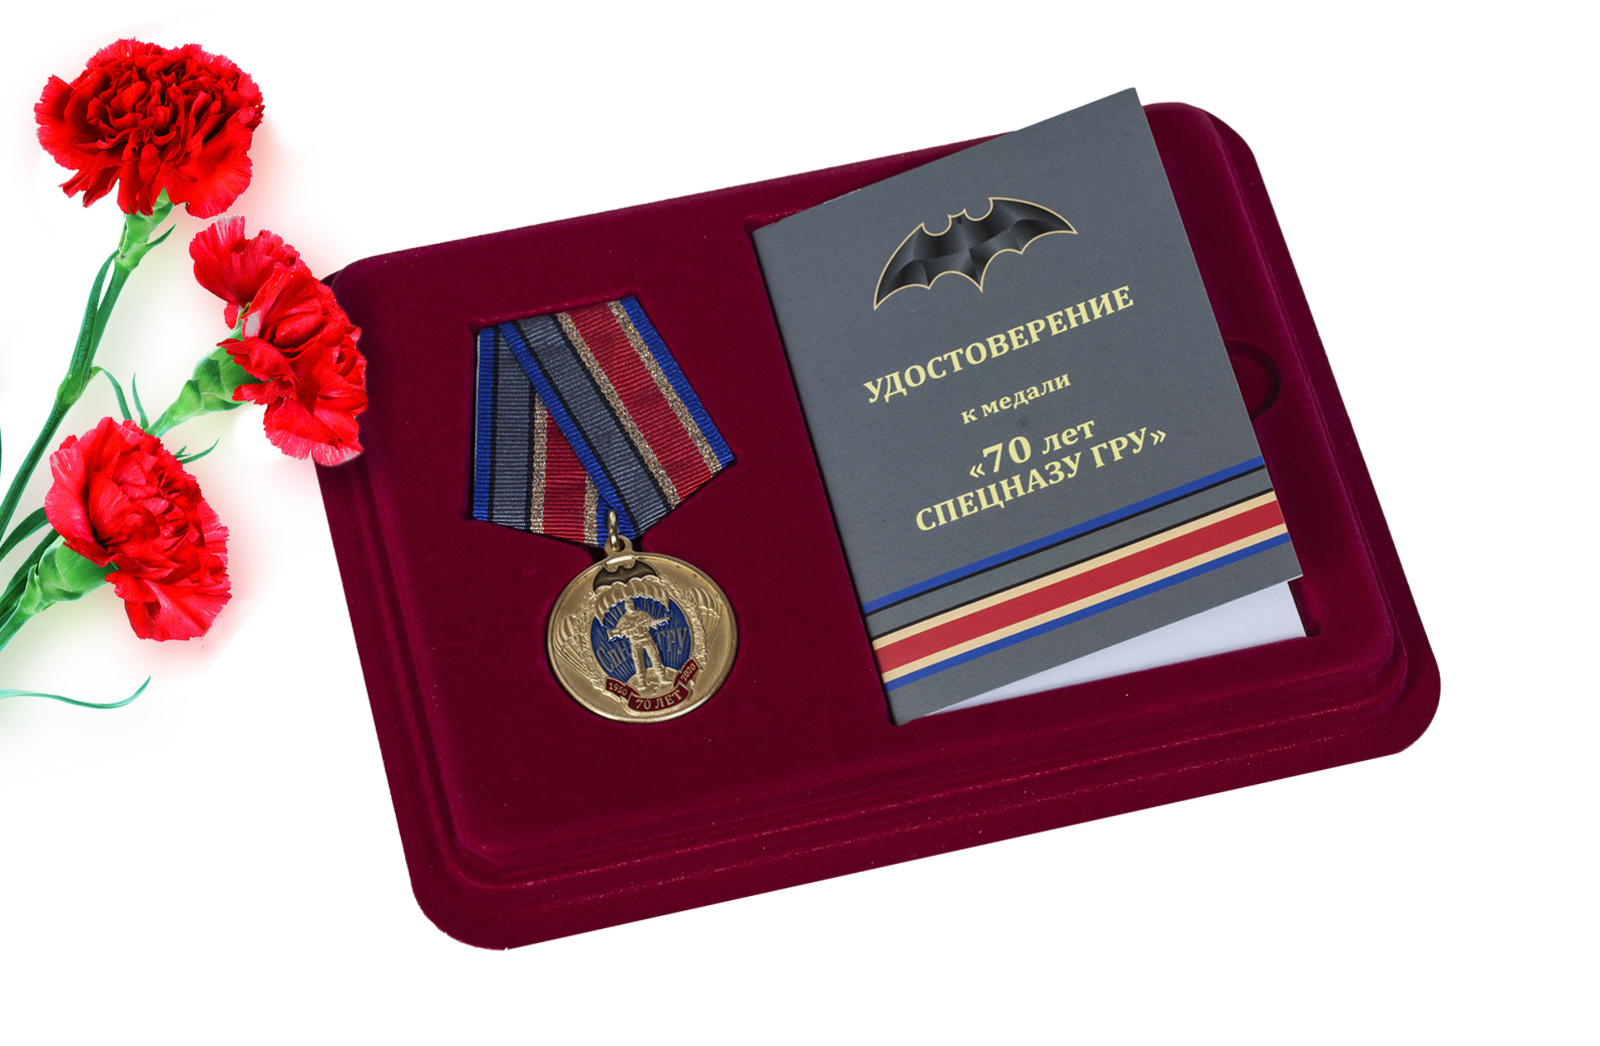 Памятная медаль 70 лет СпН ГРУ